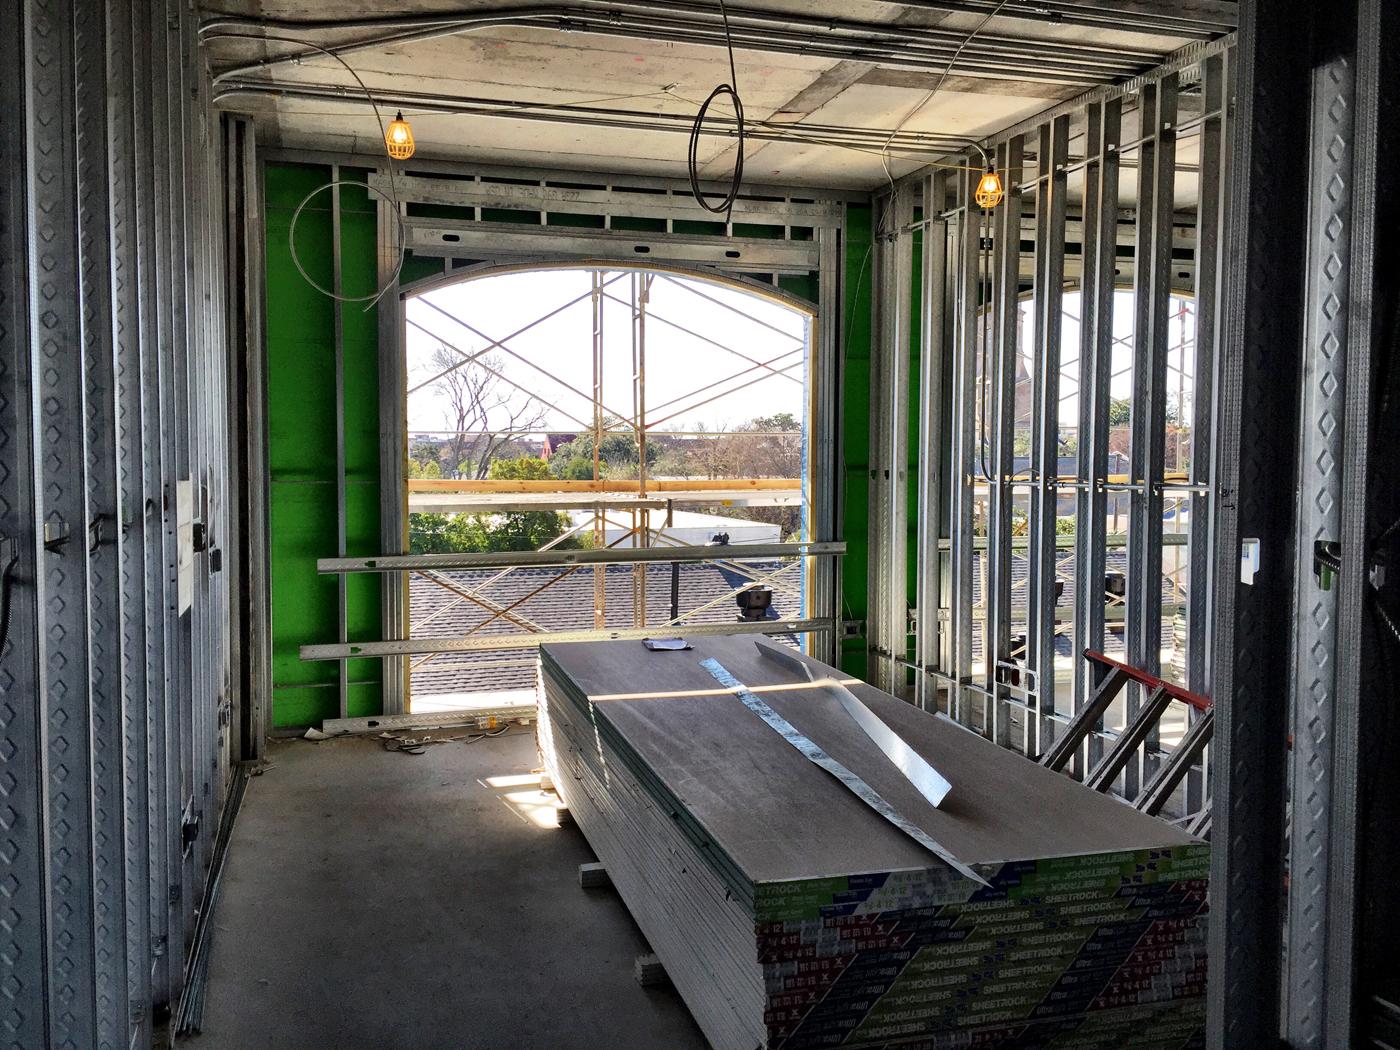 Hotel Room Construction Photo 1.